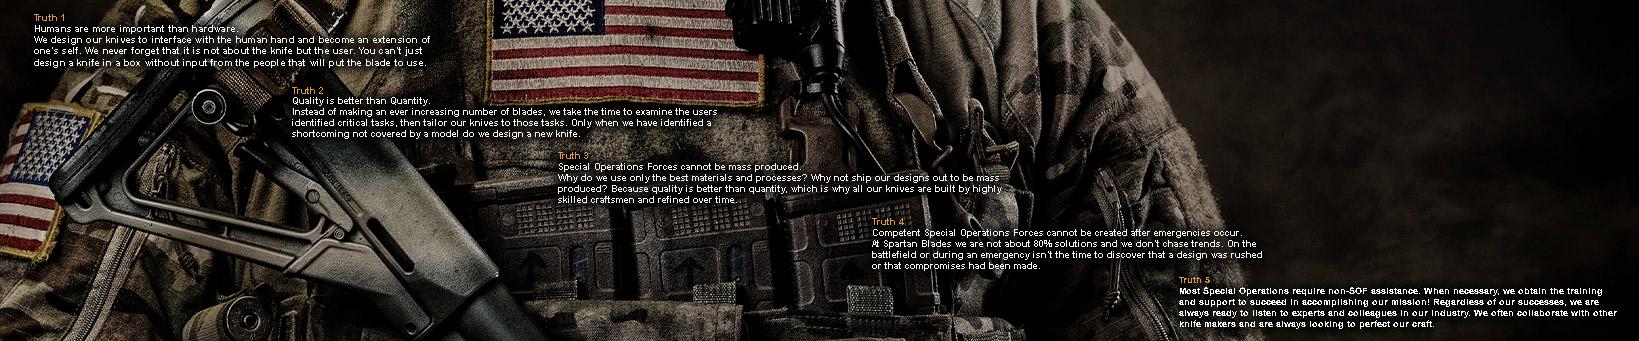 spartan-blades-sof-truths.jpg